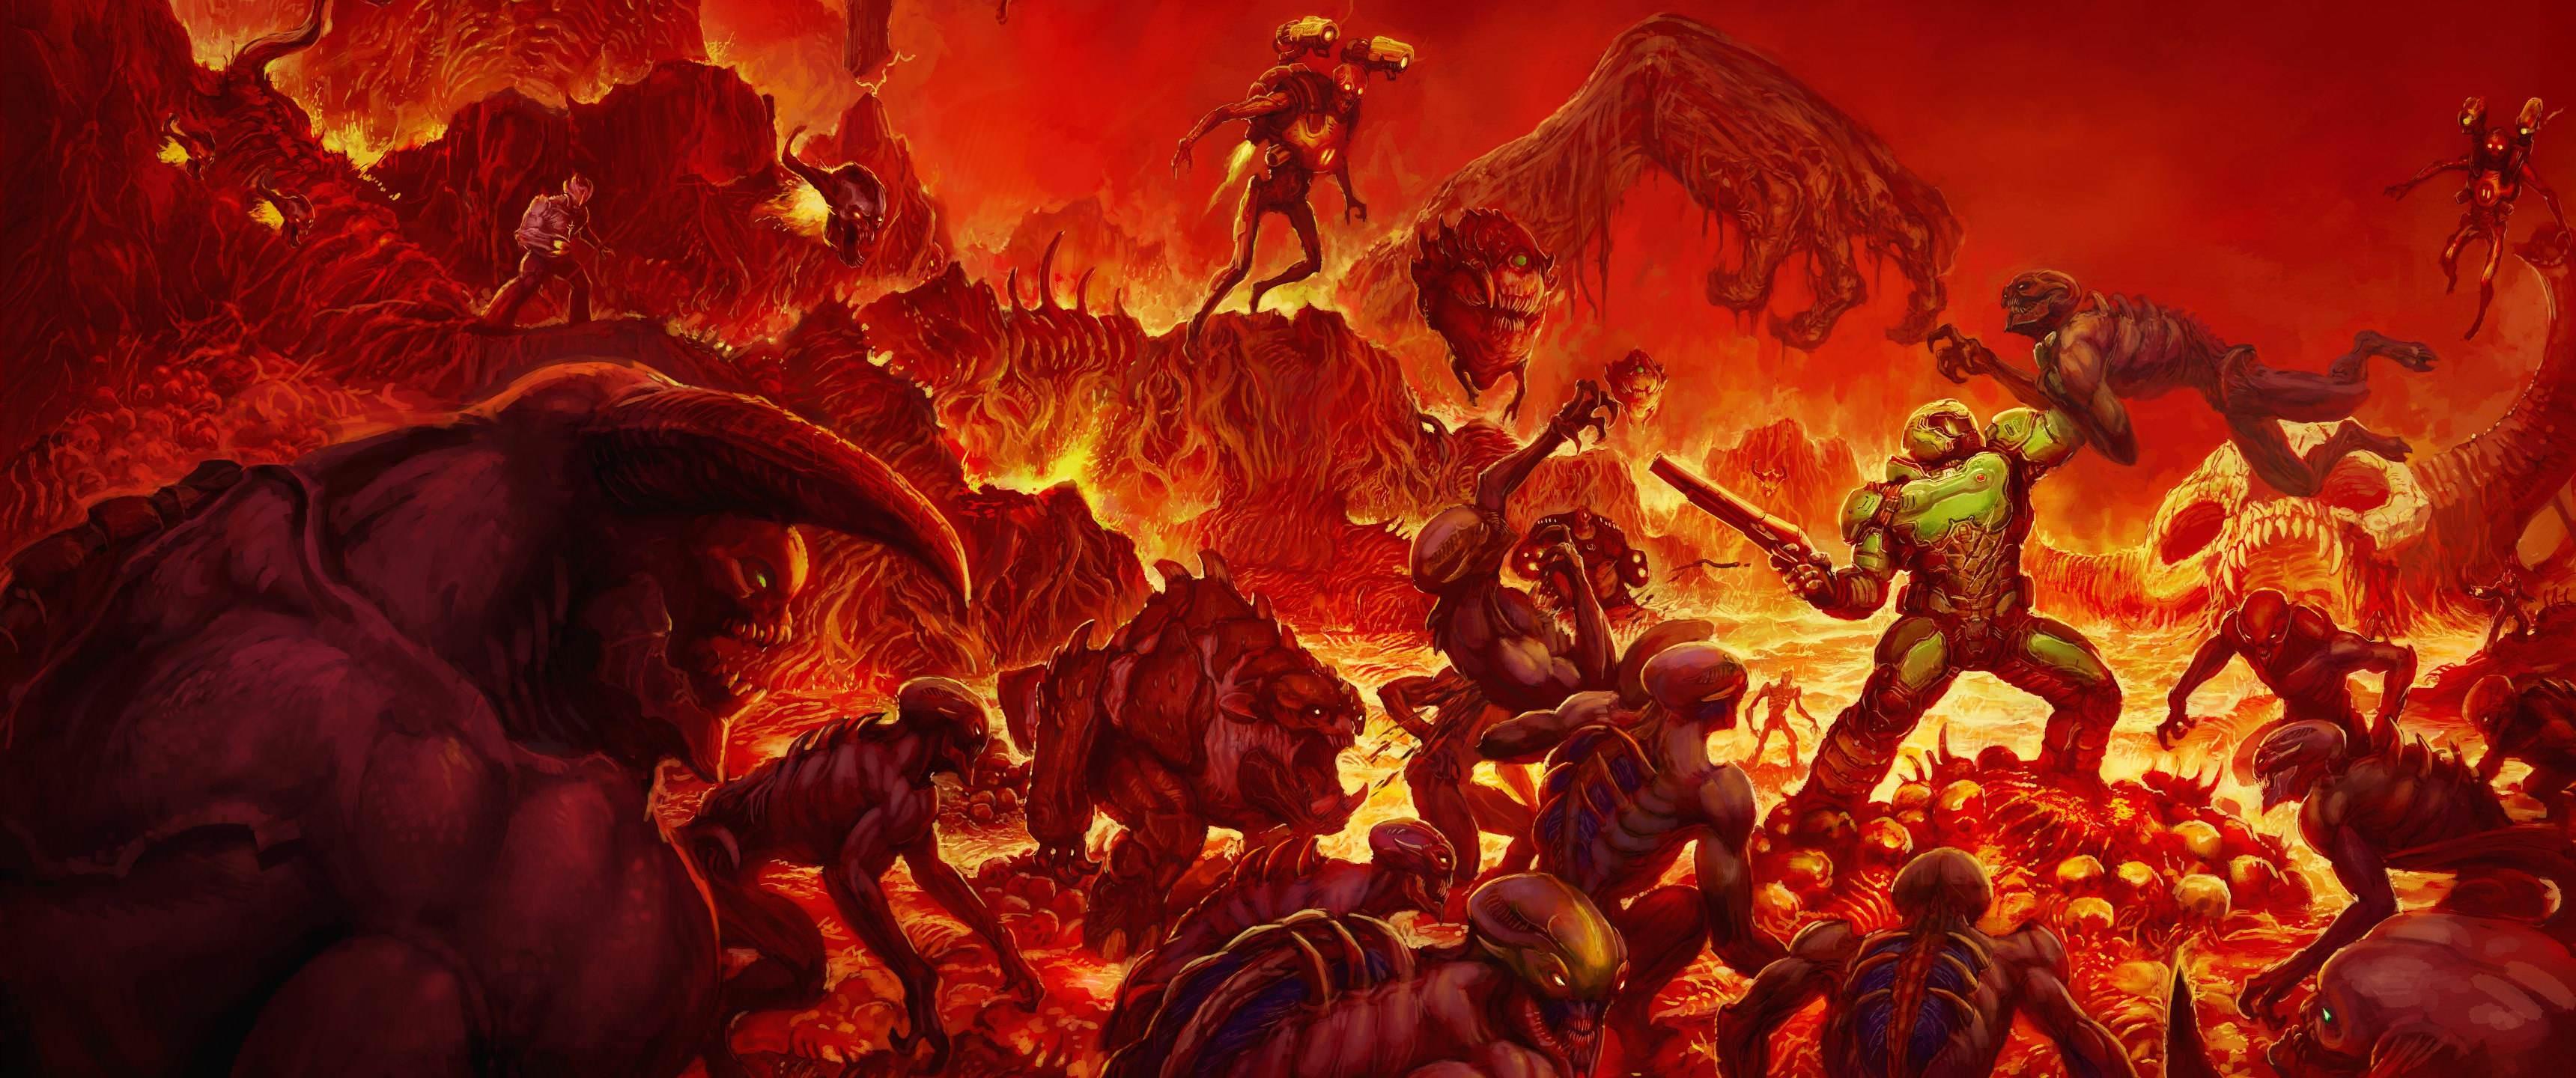 Wallpaper : doom 2016, ultrawide, video games 3440x1440 ...